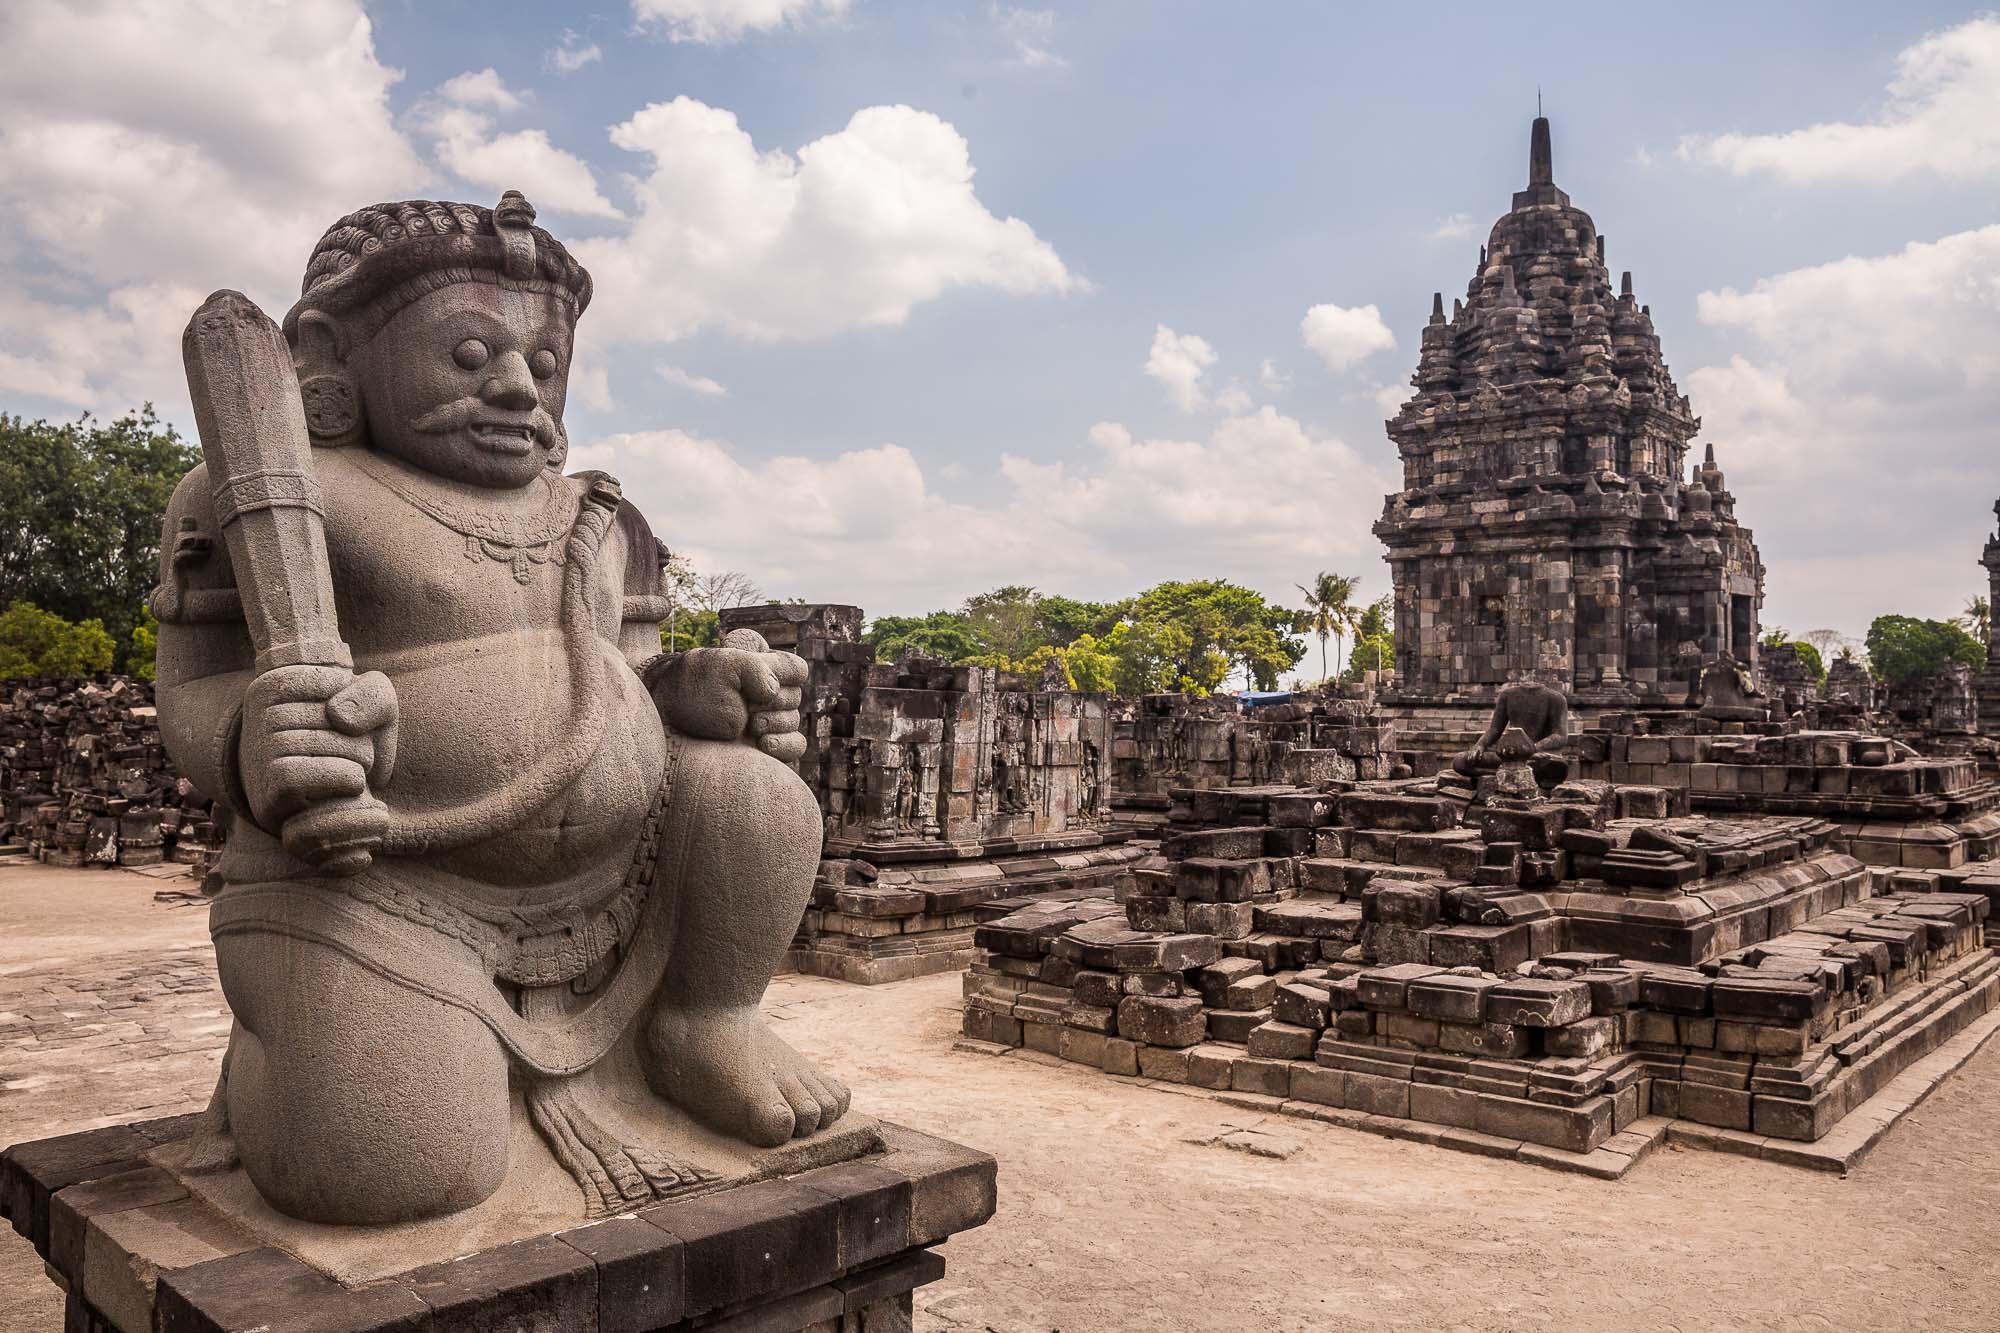 INDONESIA_2015_02 BOROBODUR-PRAMBANAN-YOGYA_JusMedic_256